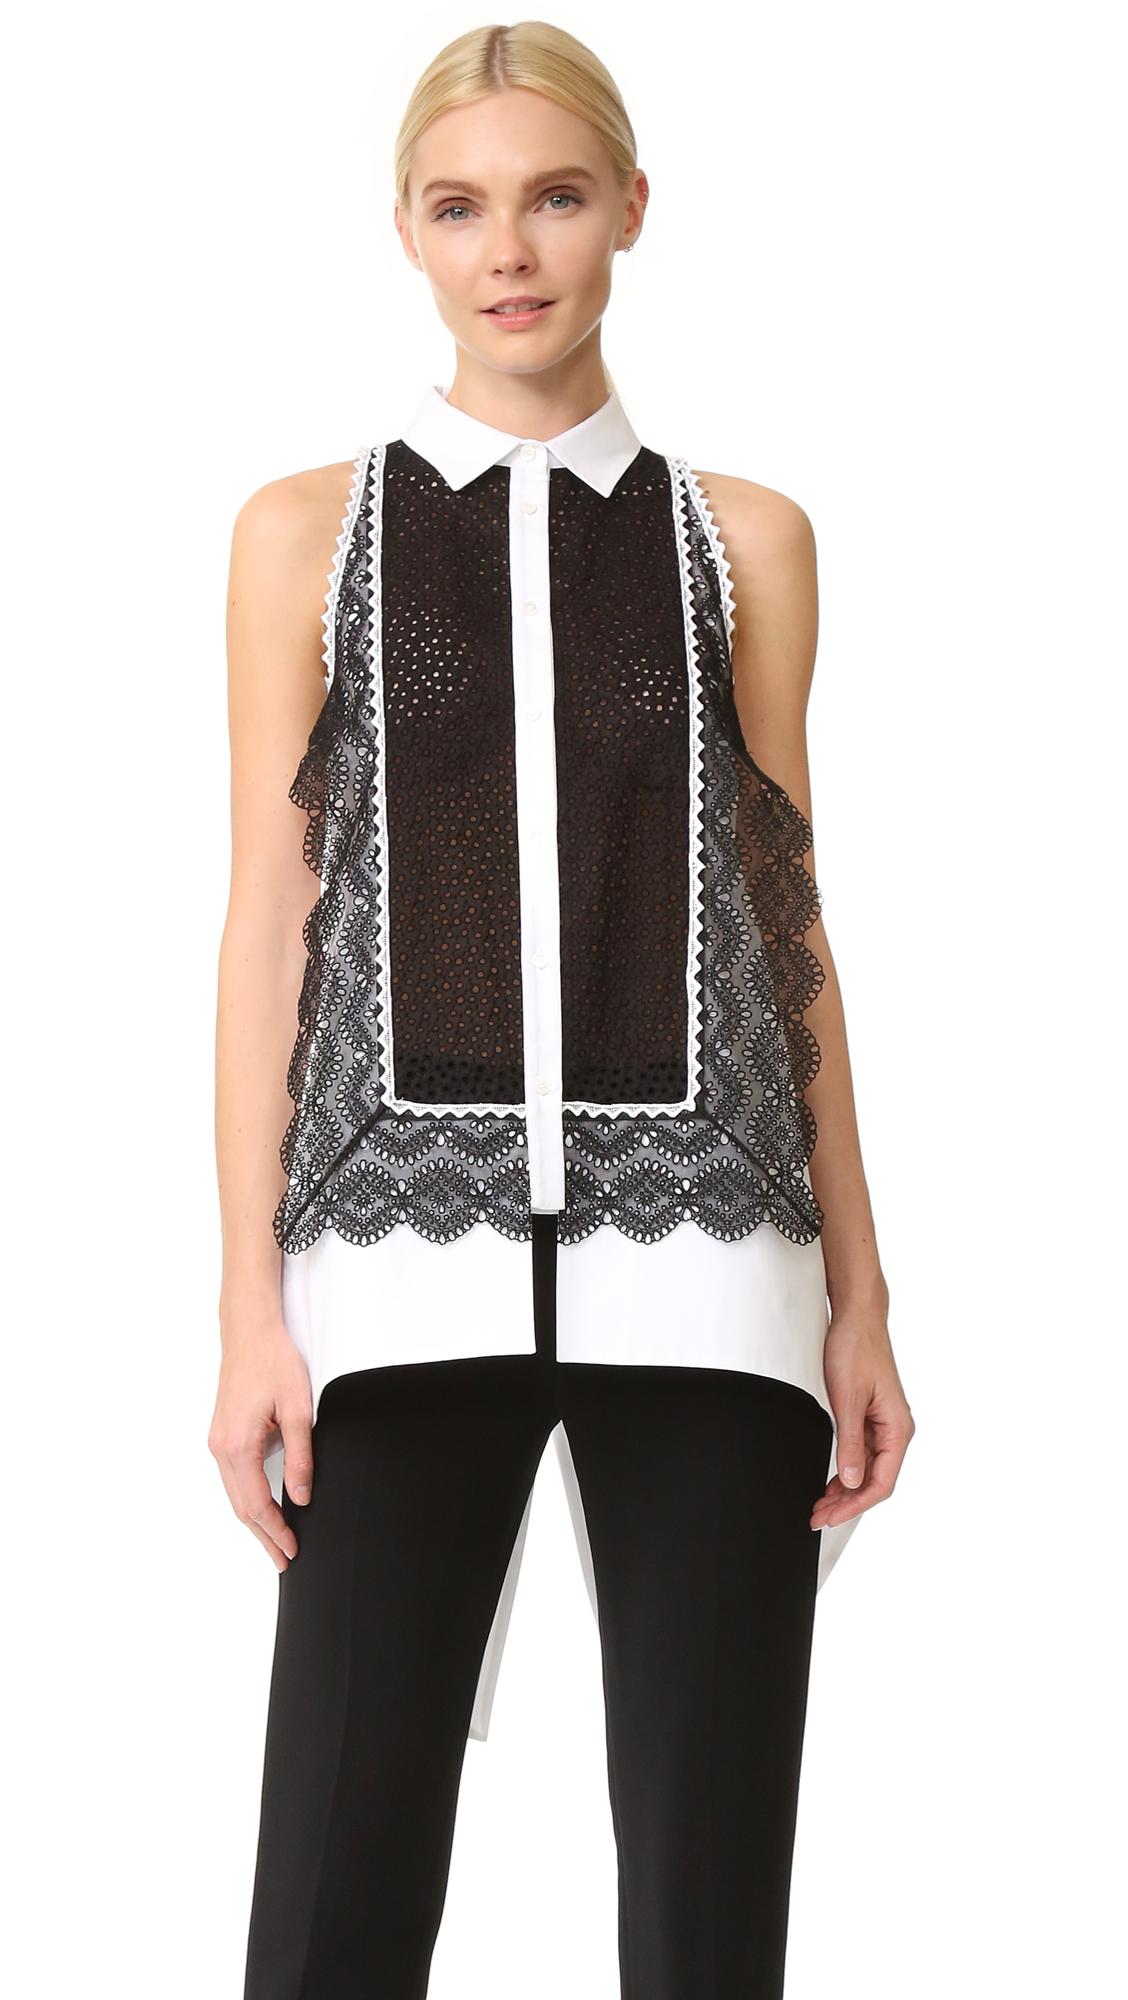 Antonio Berardi Sleeveless Blouse - Black/White at Shopbop